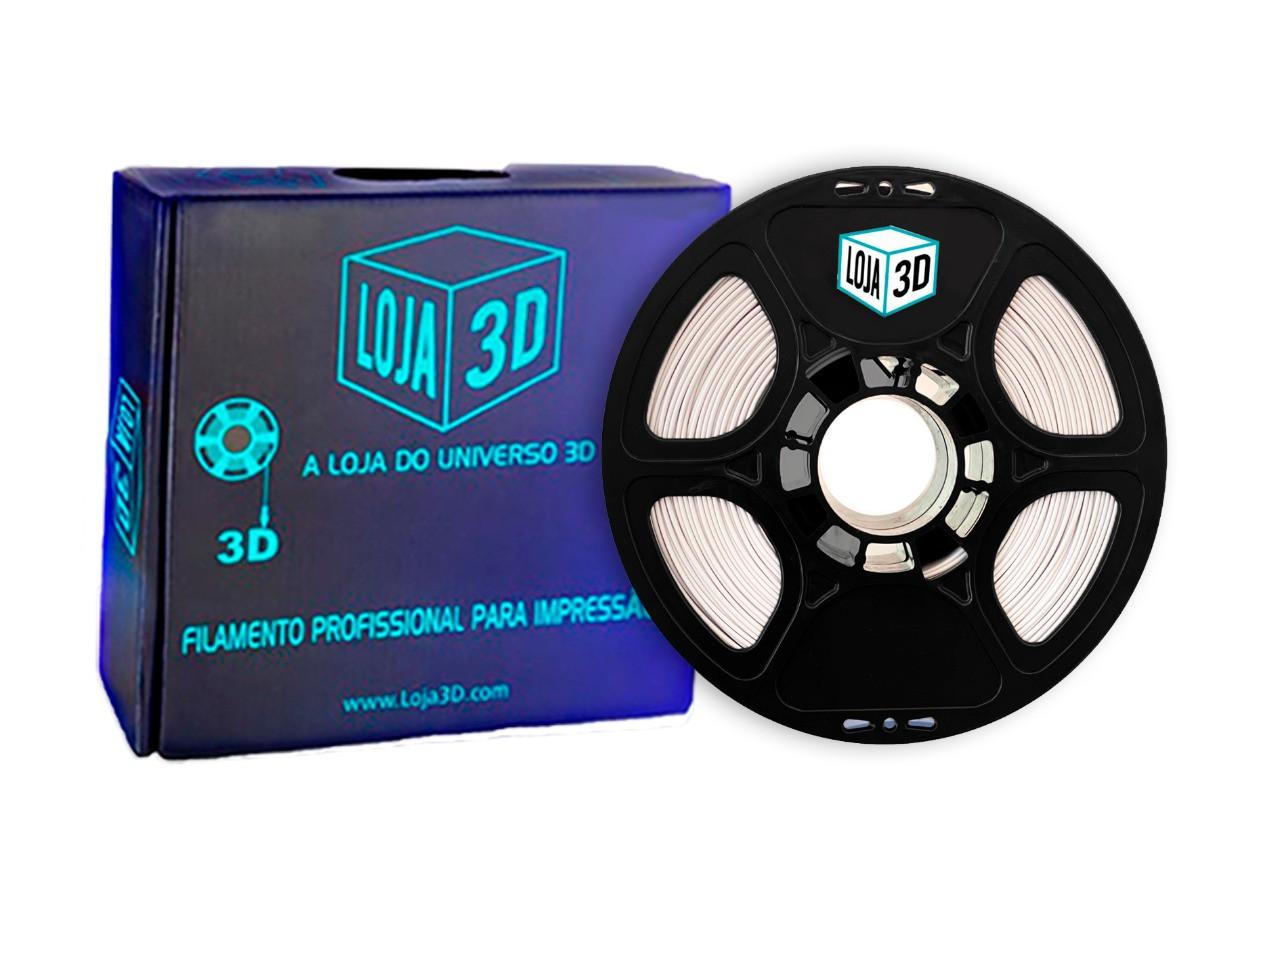 Filamento PLA Pro - ECO - Gelo - Loja 3D - 1.75mm - 1kg